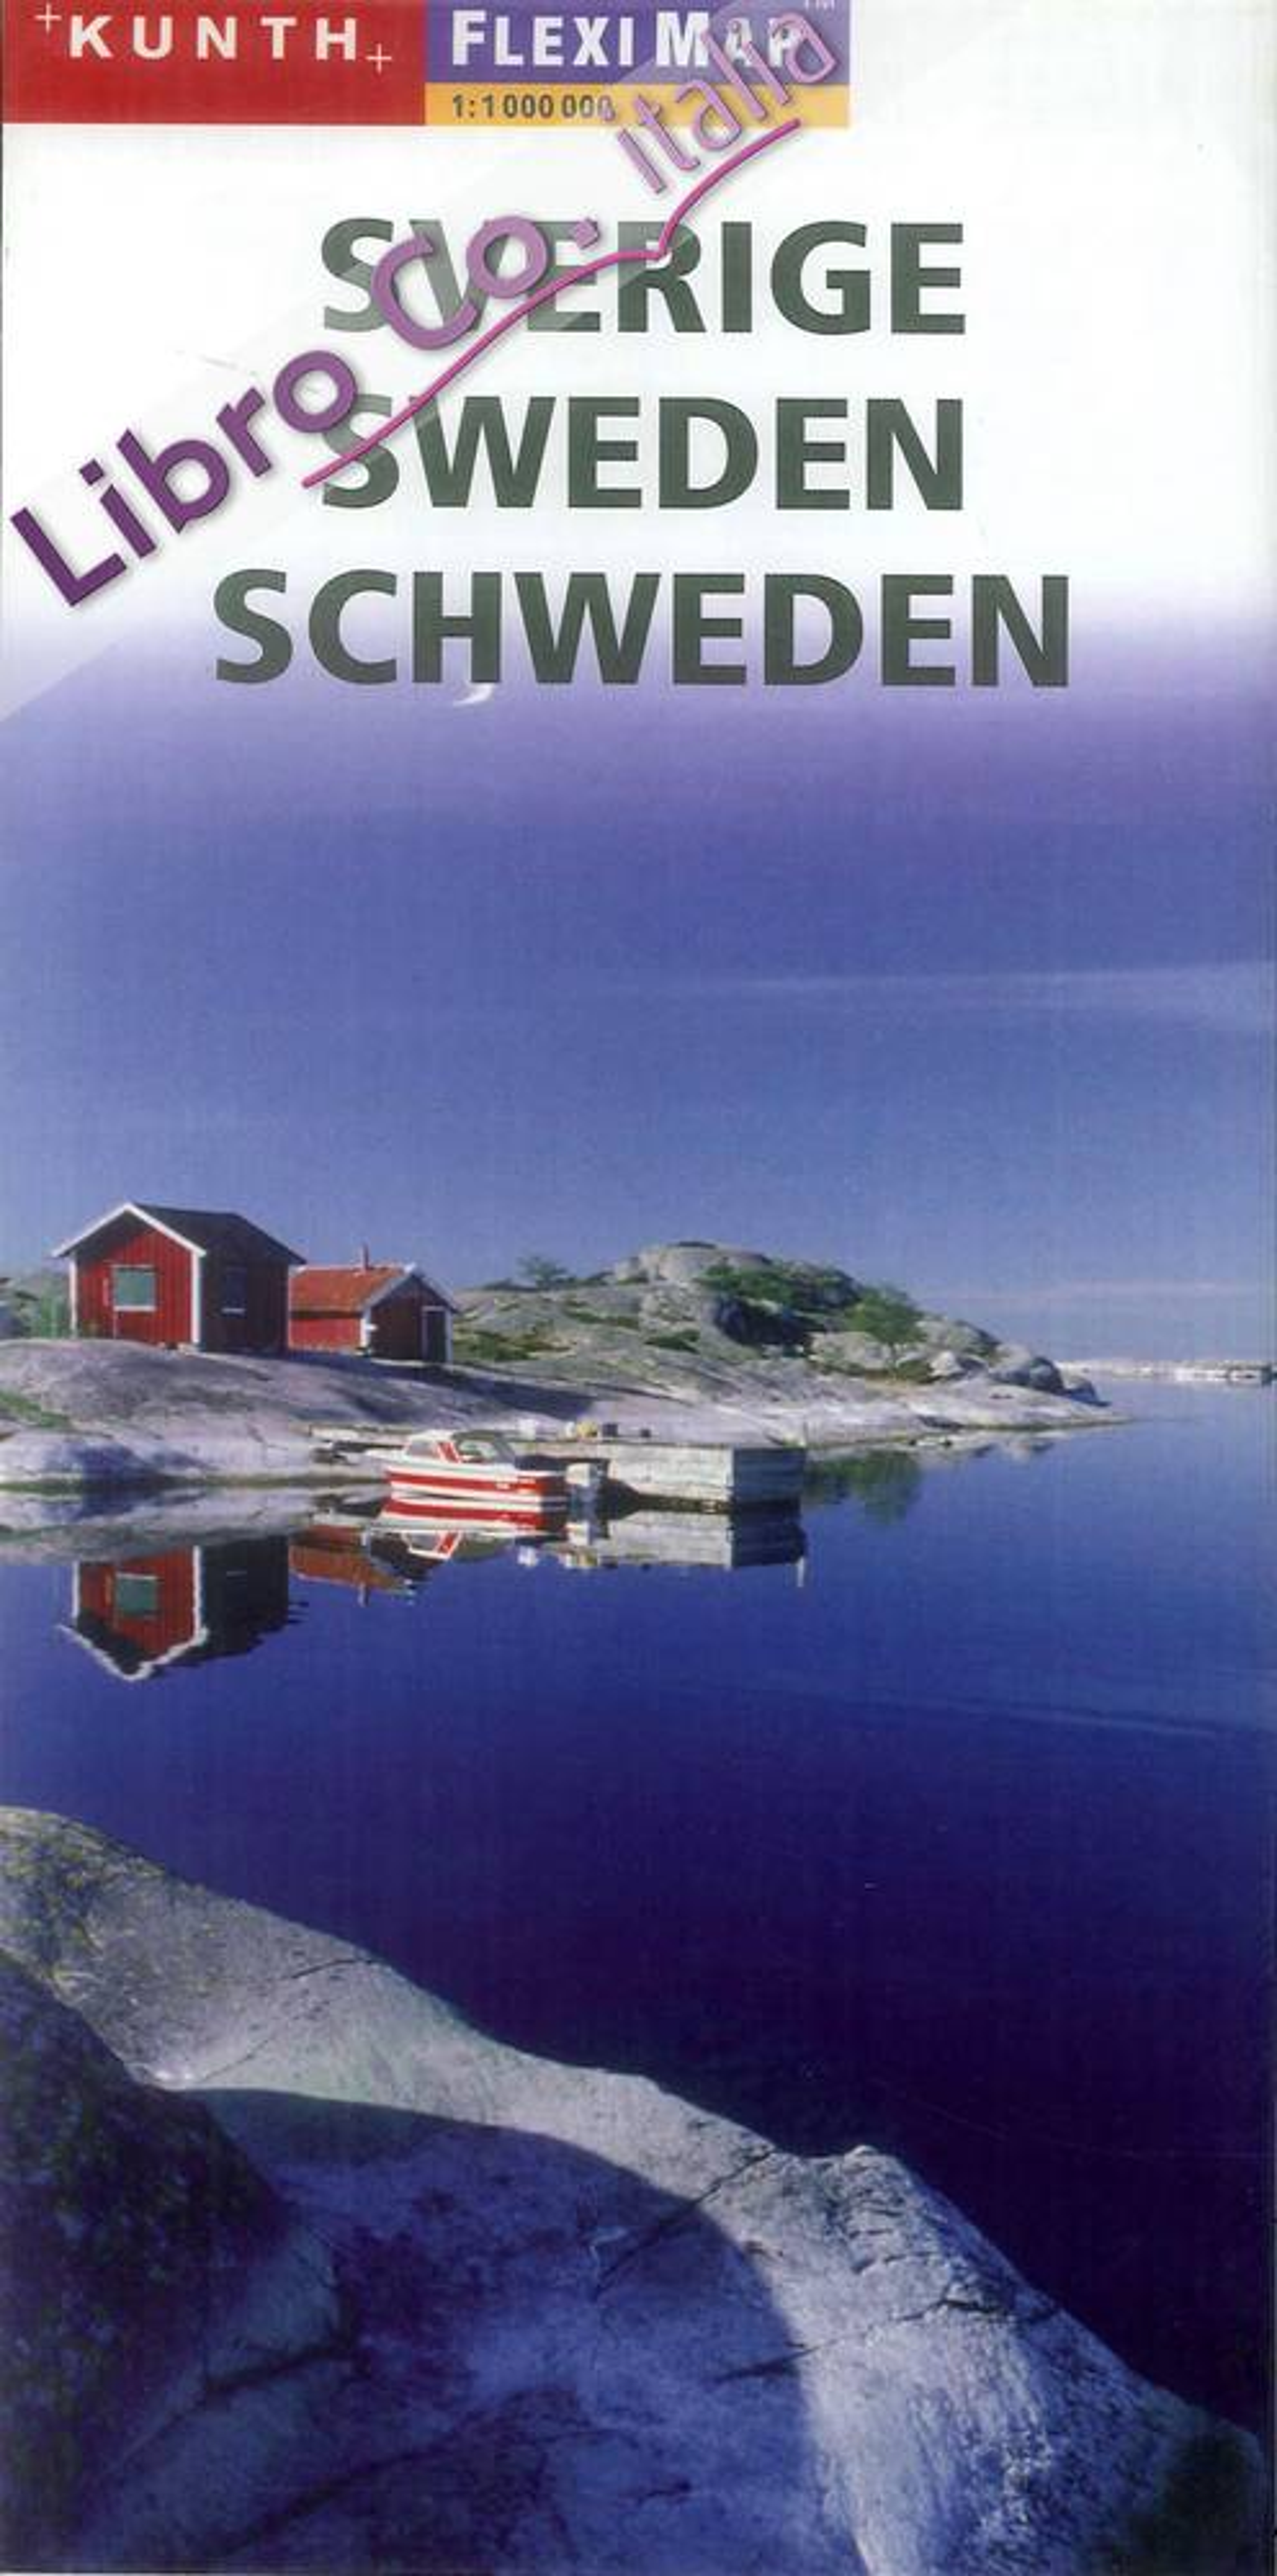 Sverige. Sweden. Schweden. Flexi map 1:1 000 000